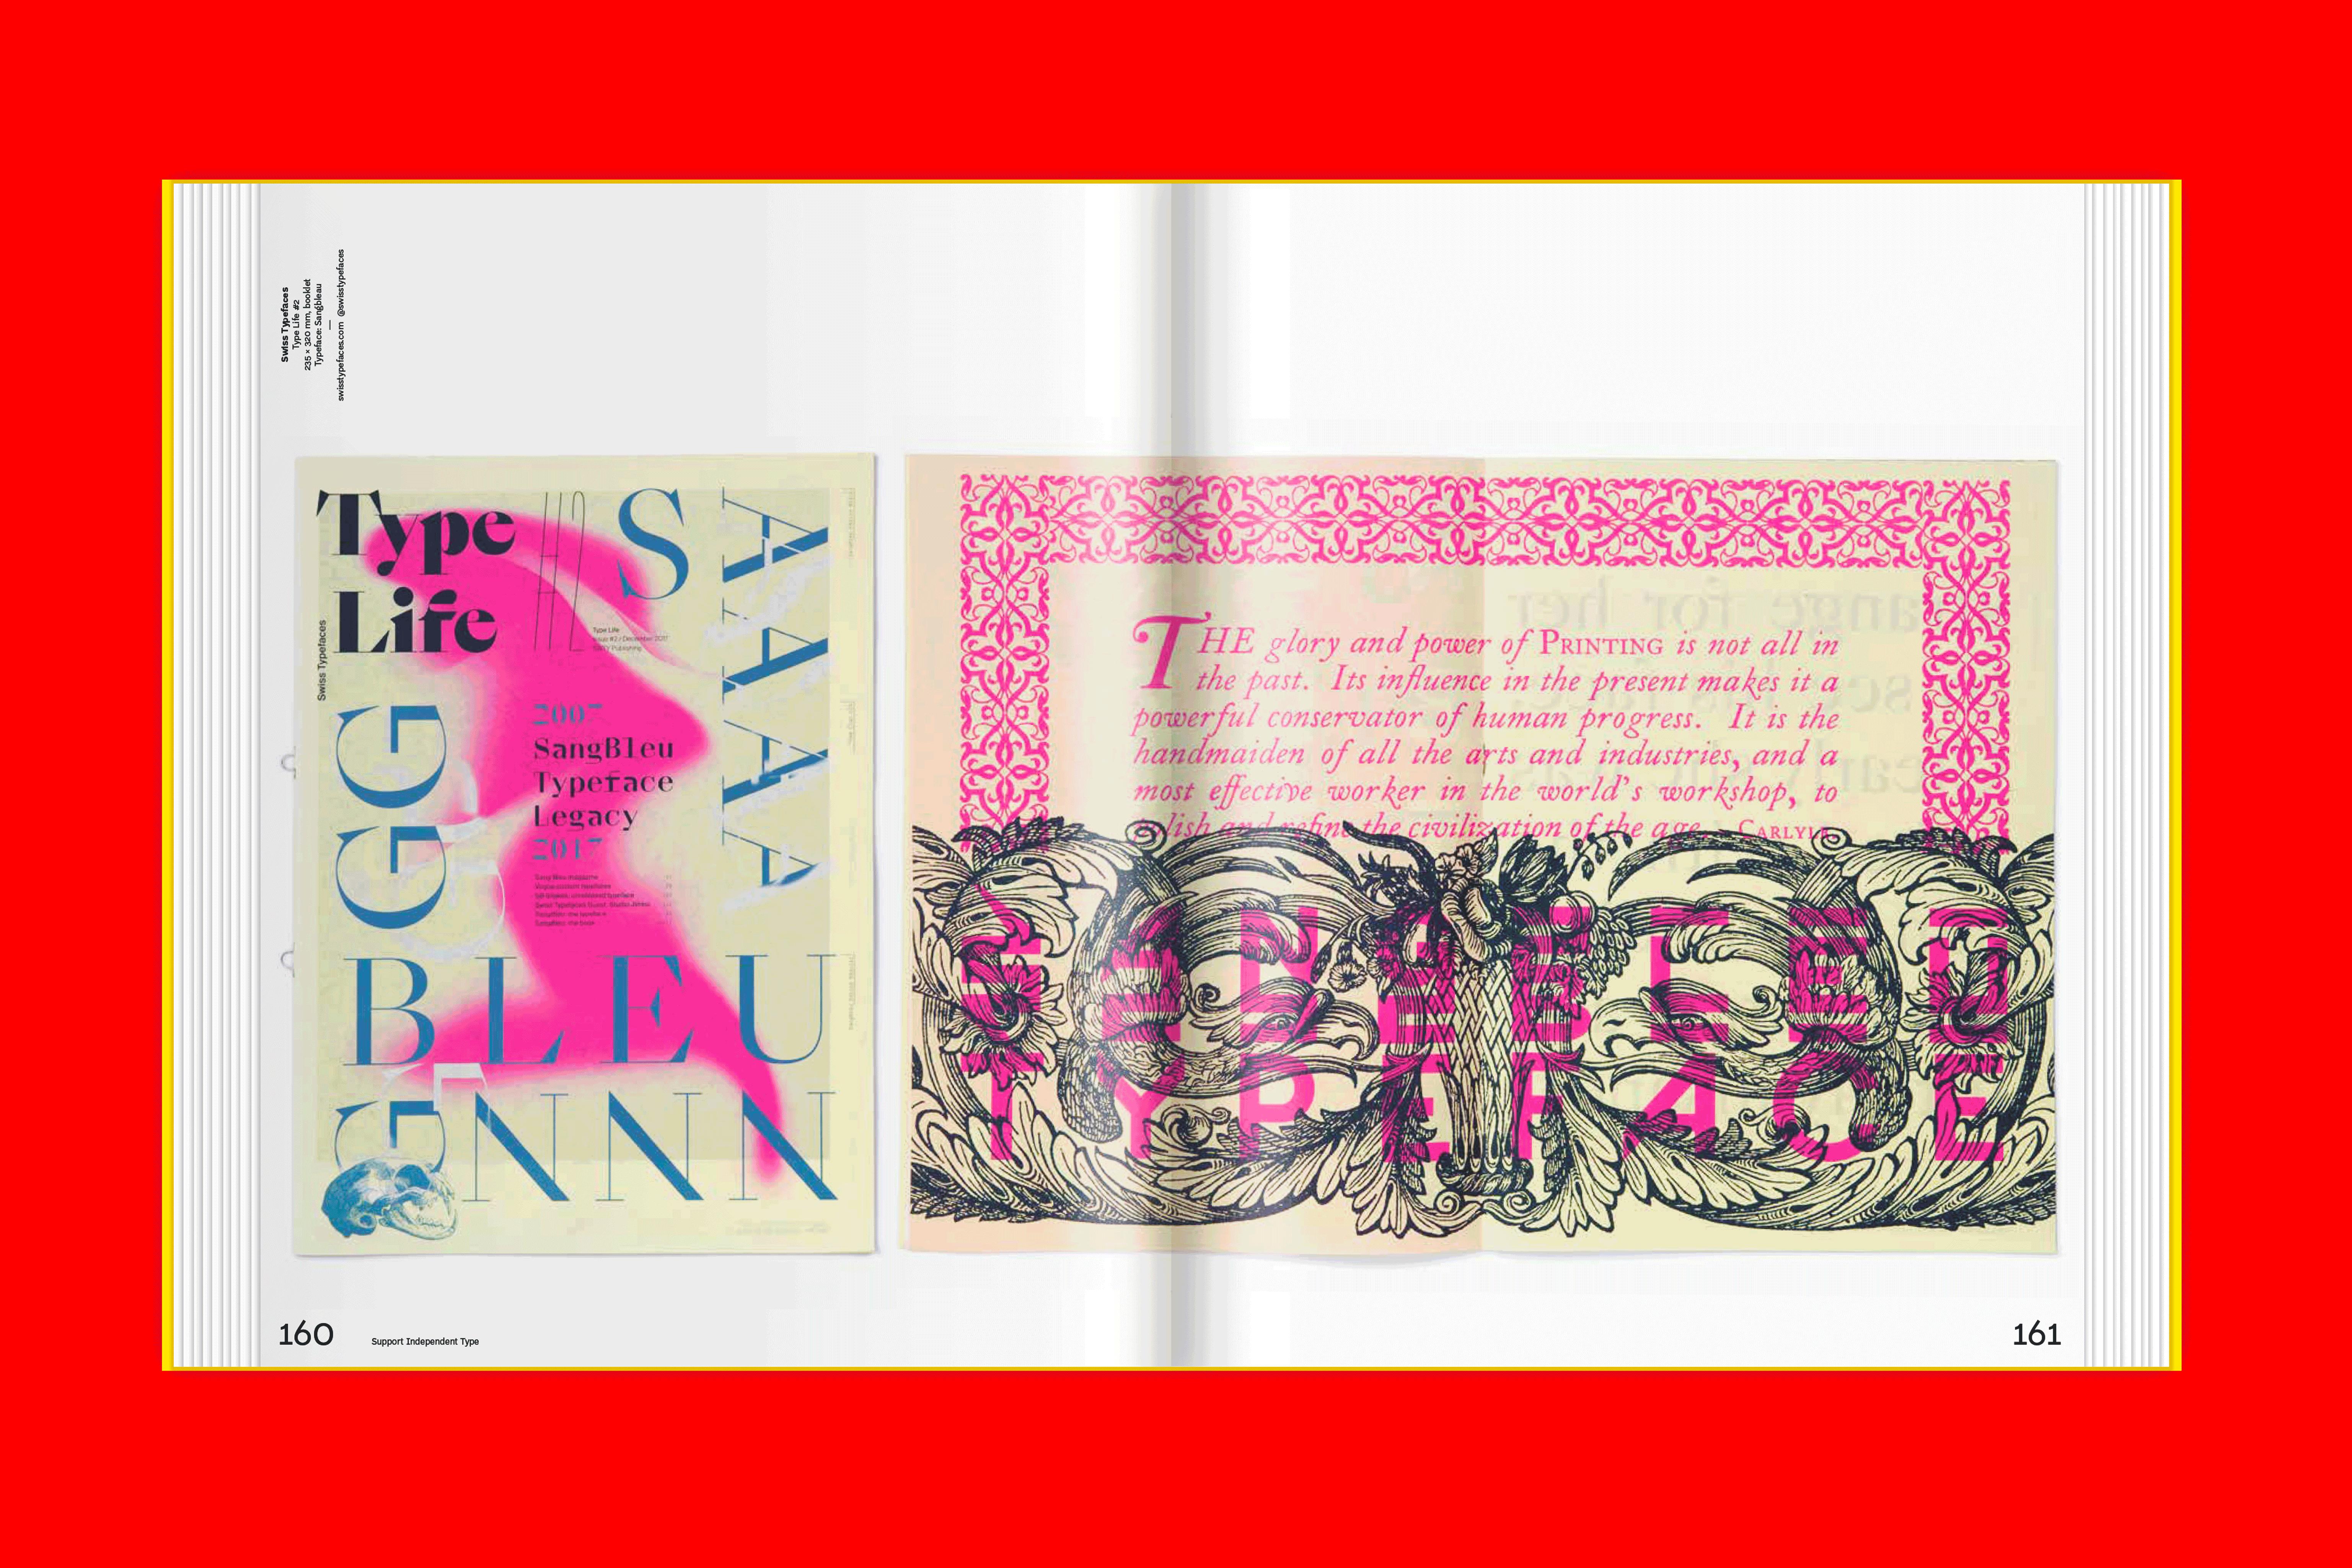 Slanted-Publiaktionen-Slanted-Publishers-Support-Independent-Type_20